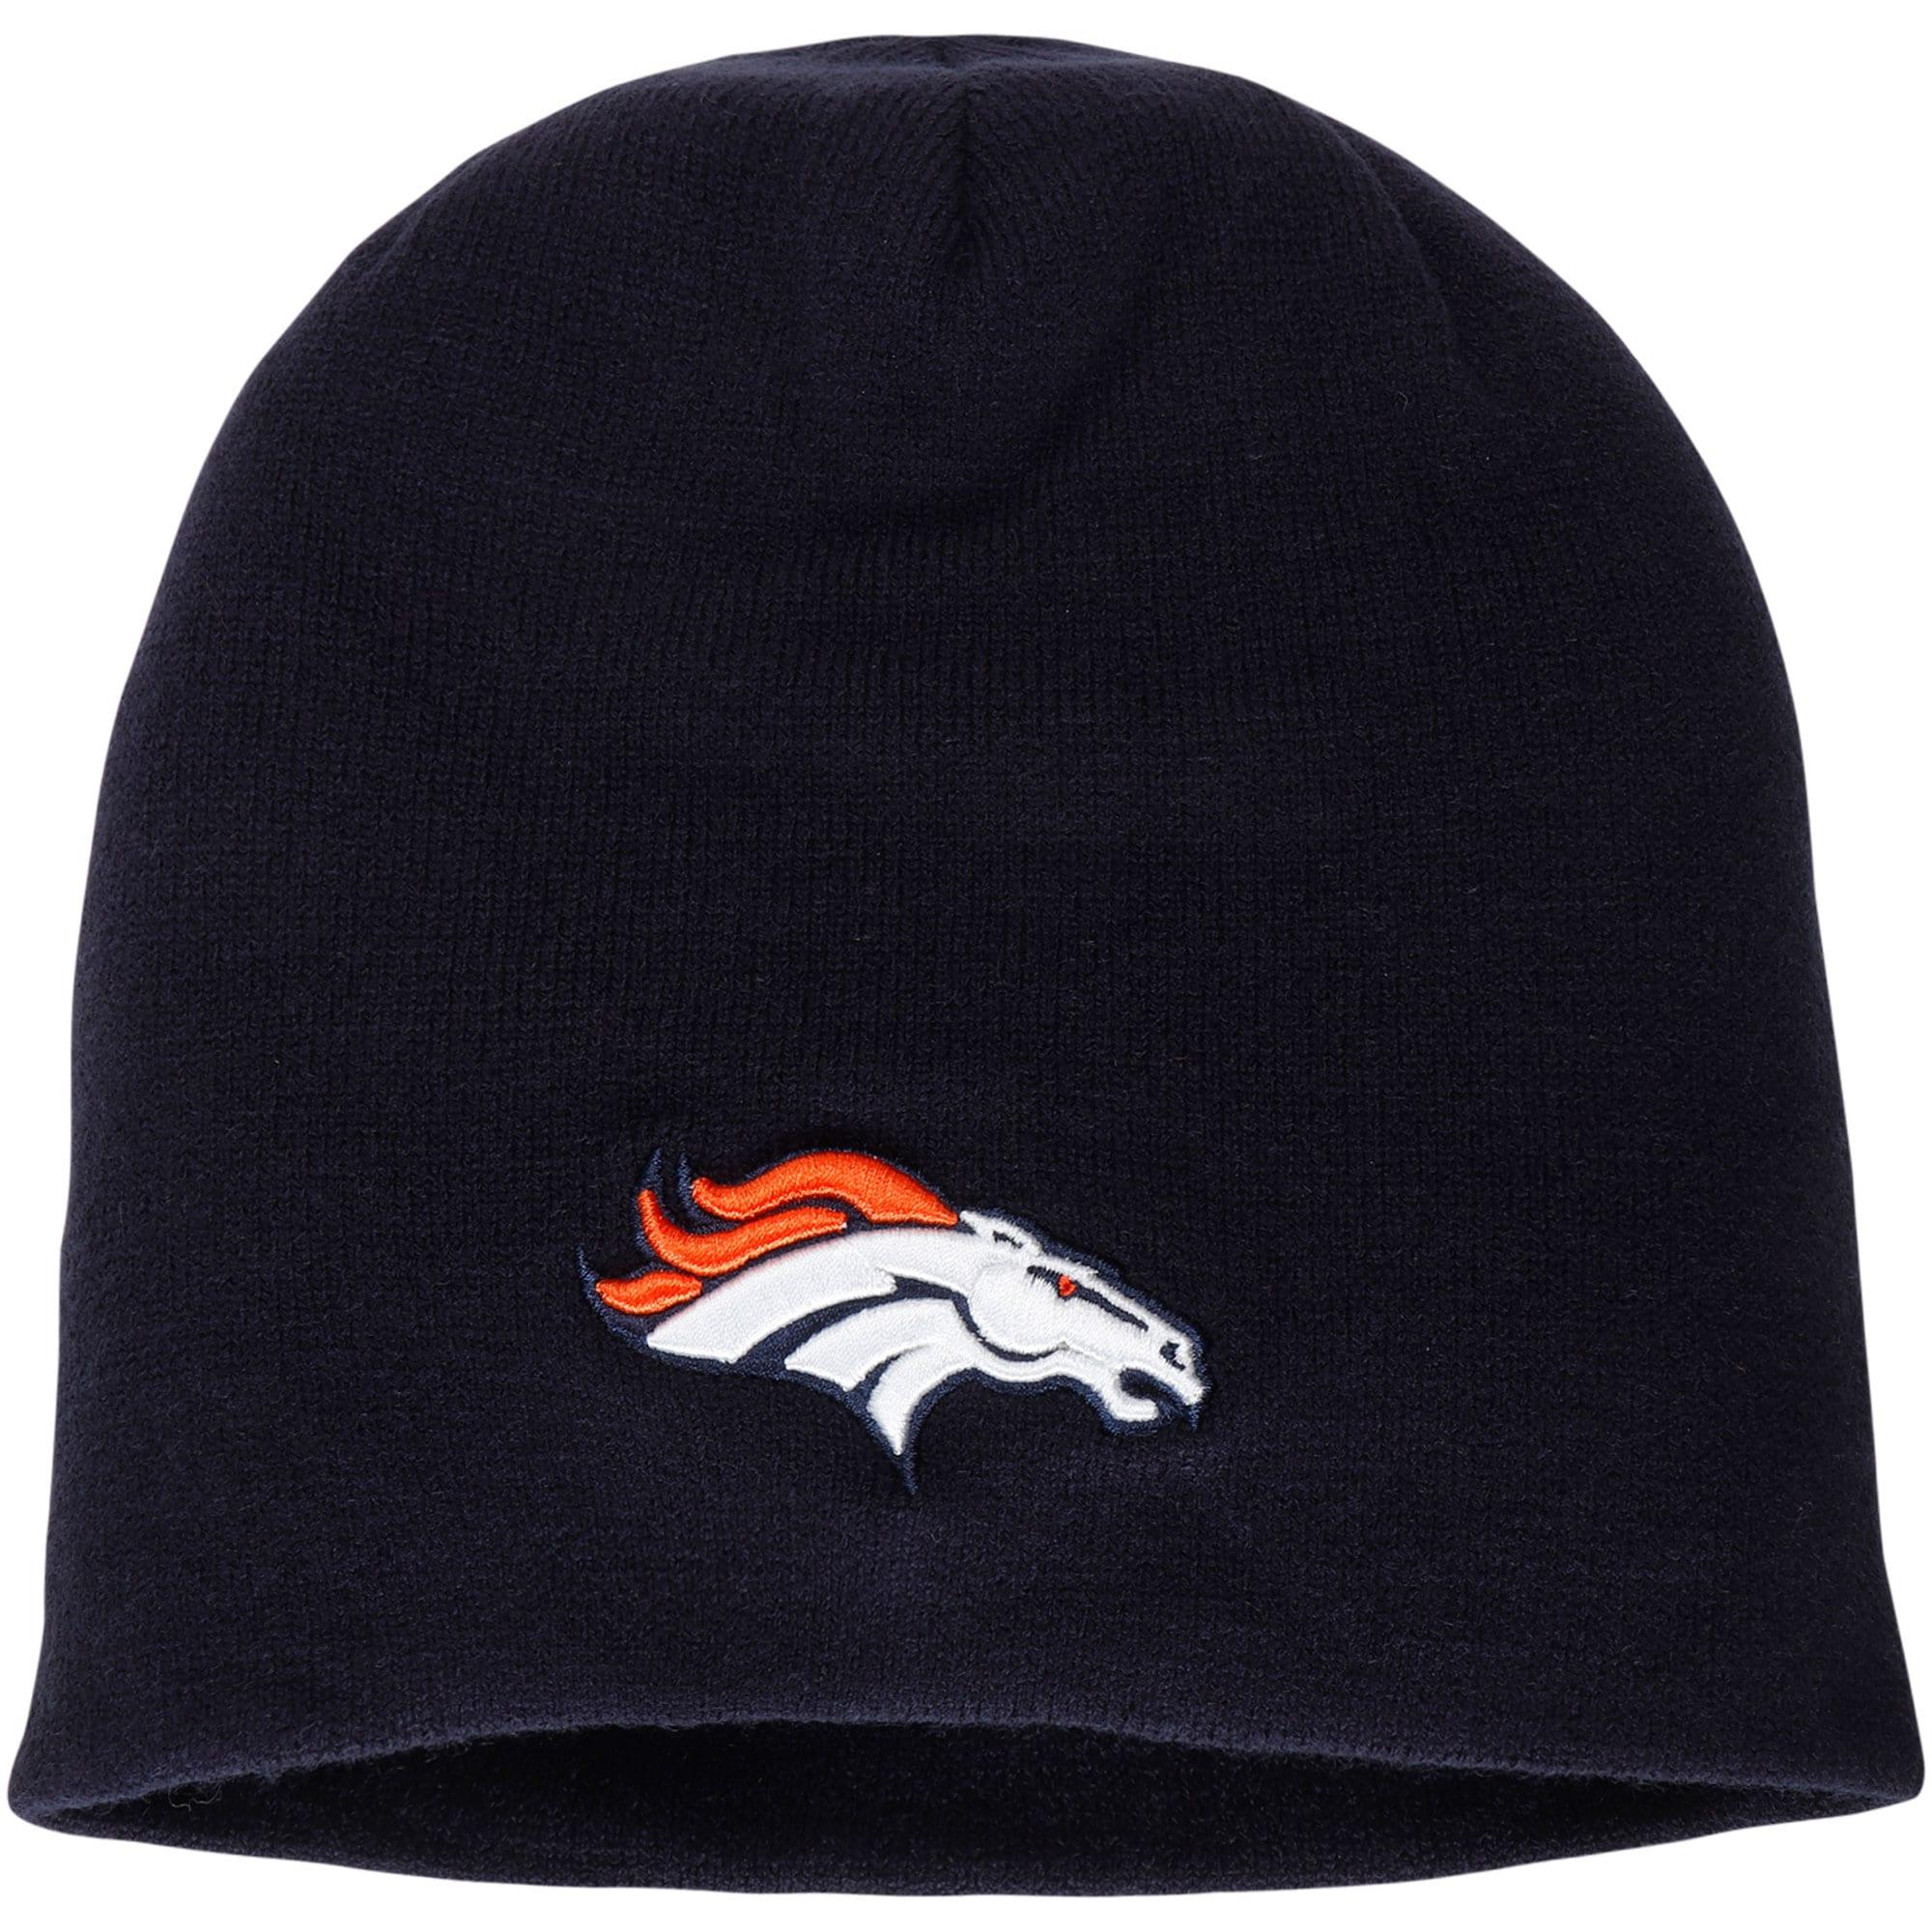 Denver Broncos NFL Pro Line by Fanatics Branded Core Uncuffed Knit Beanie - Navy